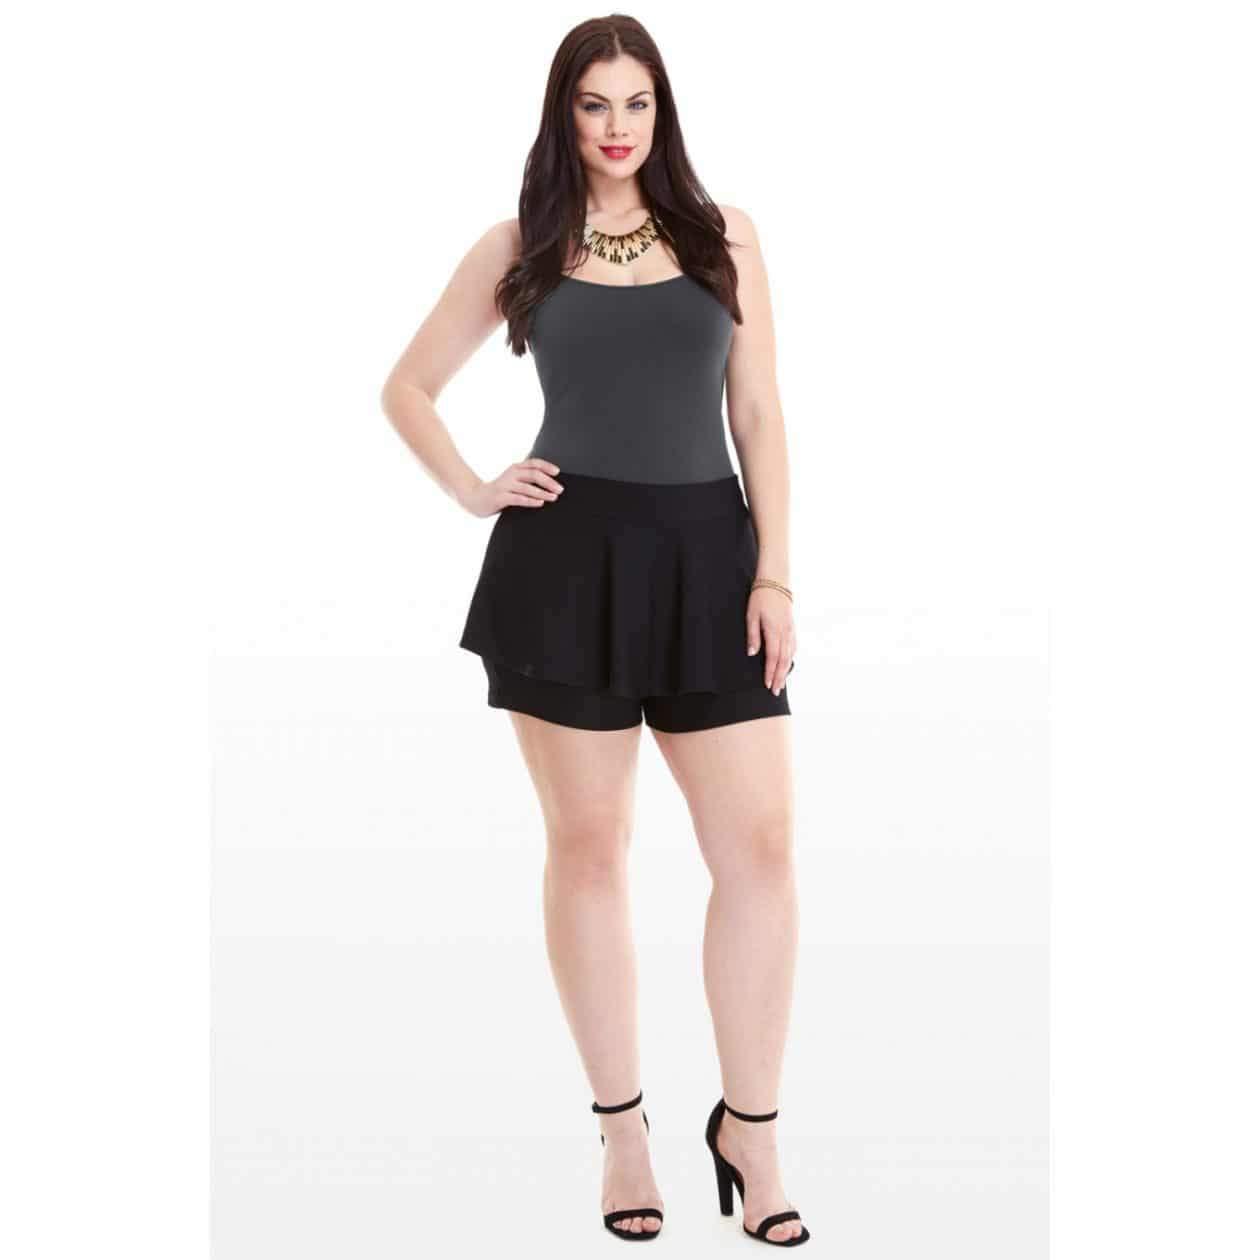 Fashion to Figure Plus Size Peplum Shorts on The Curvy Fashionista